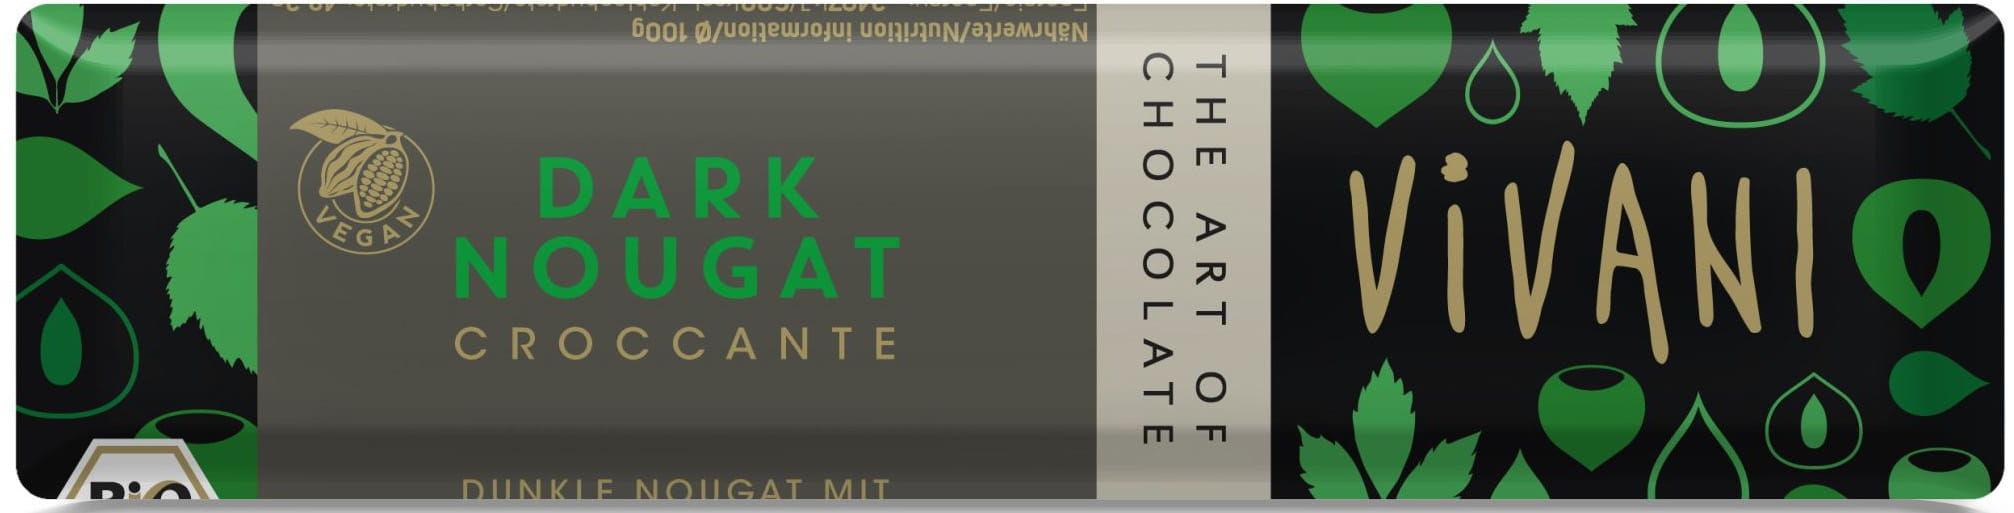 Baton croccante czekolada gorzka nugatowa bio 35 g - vivani